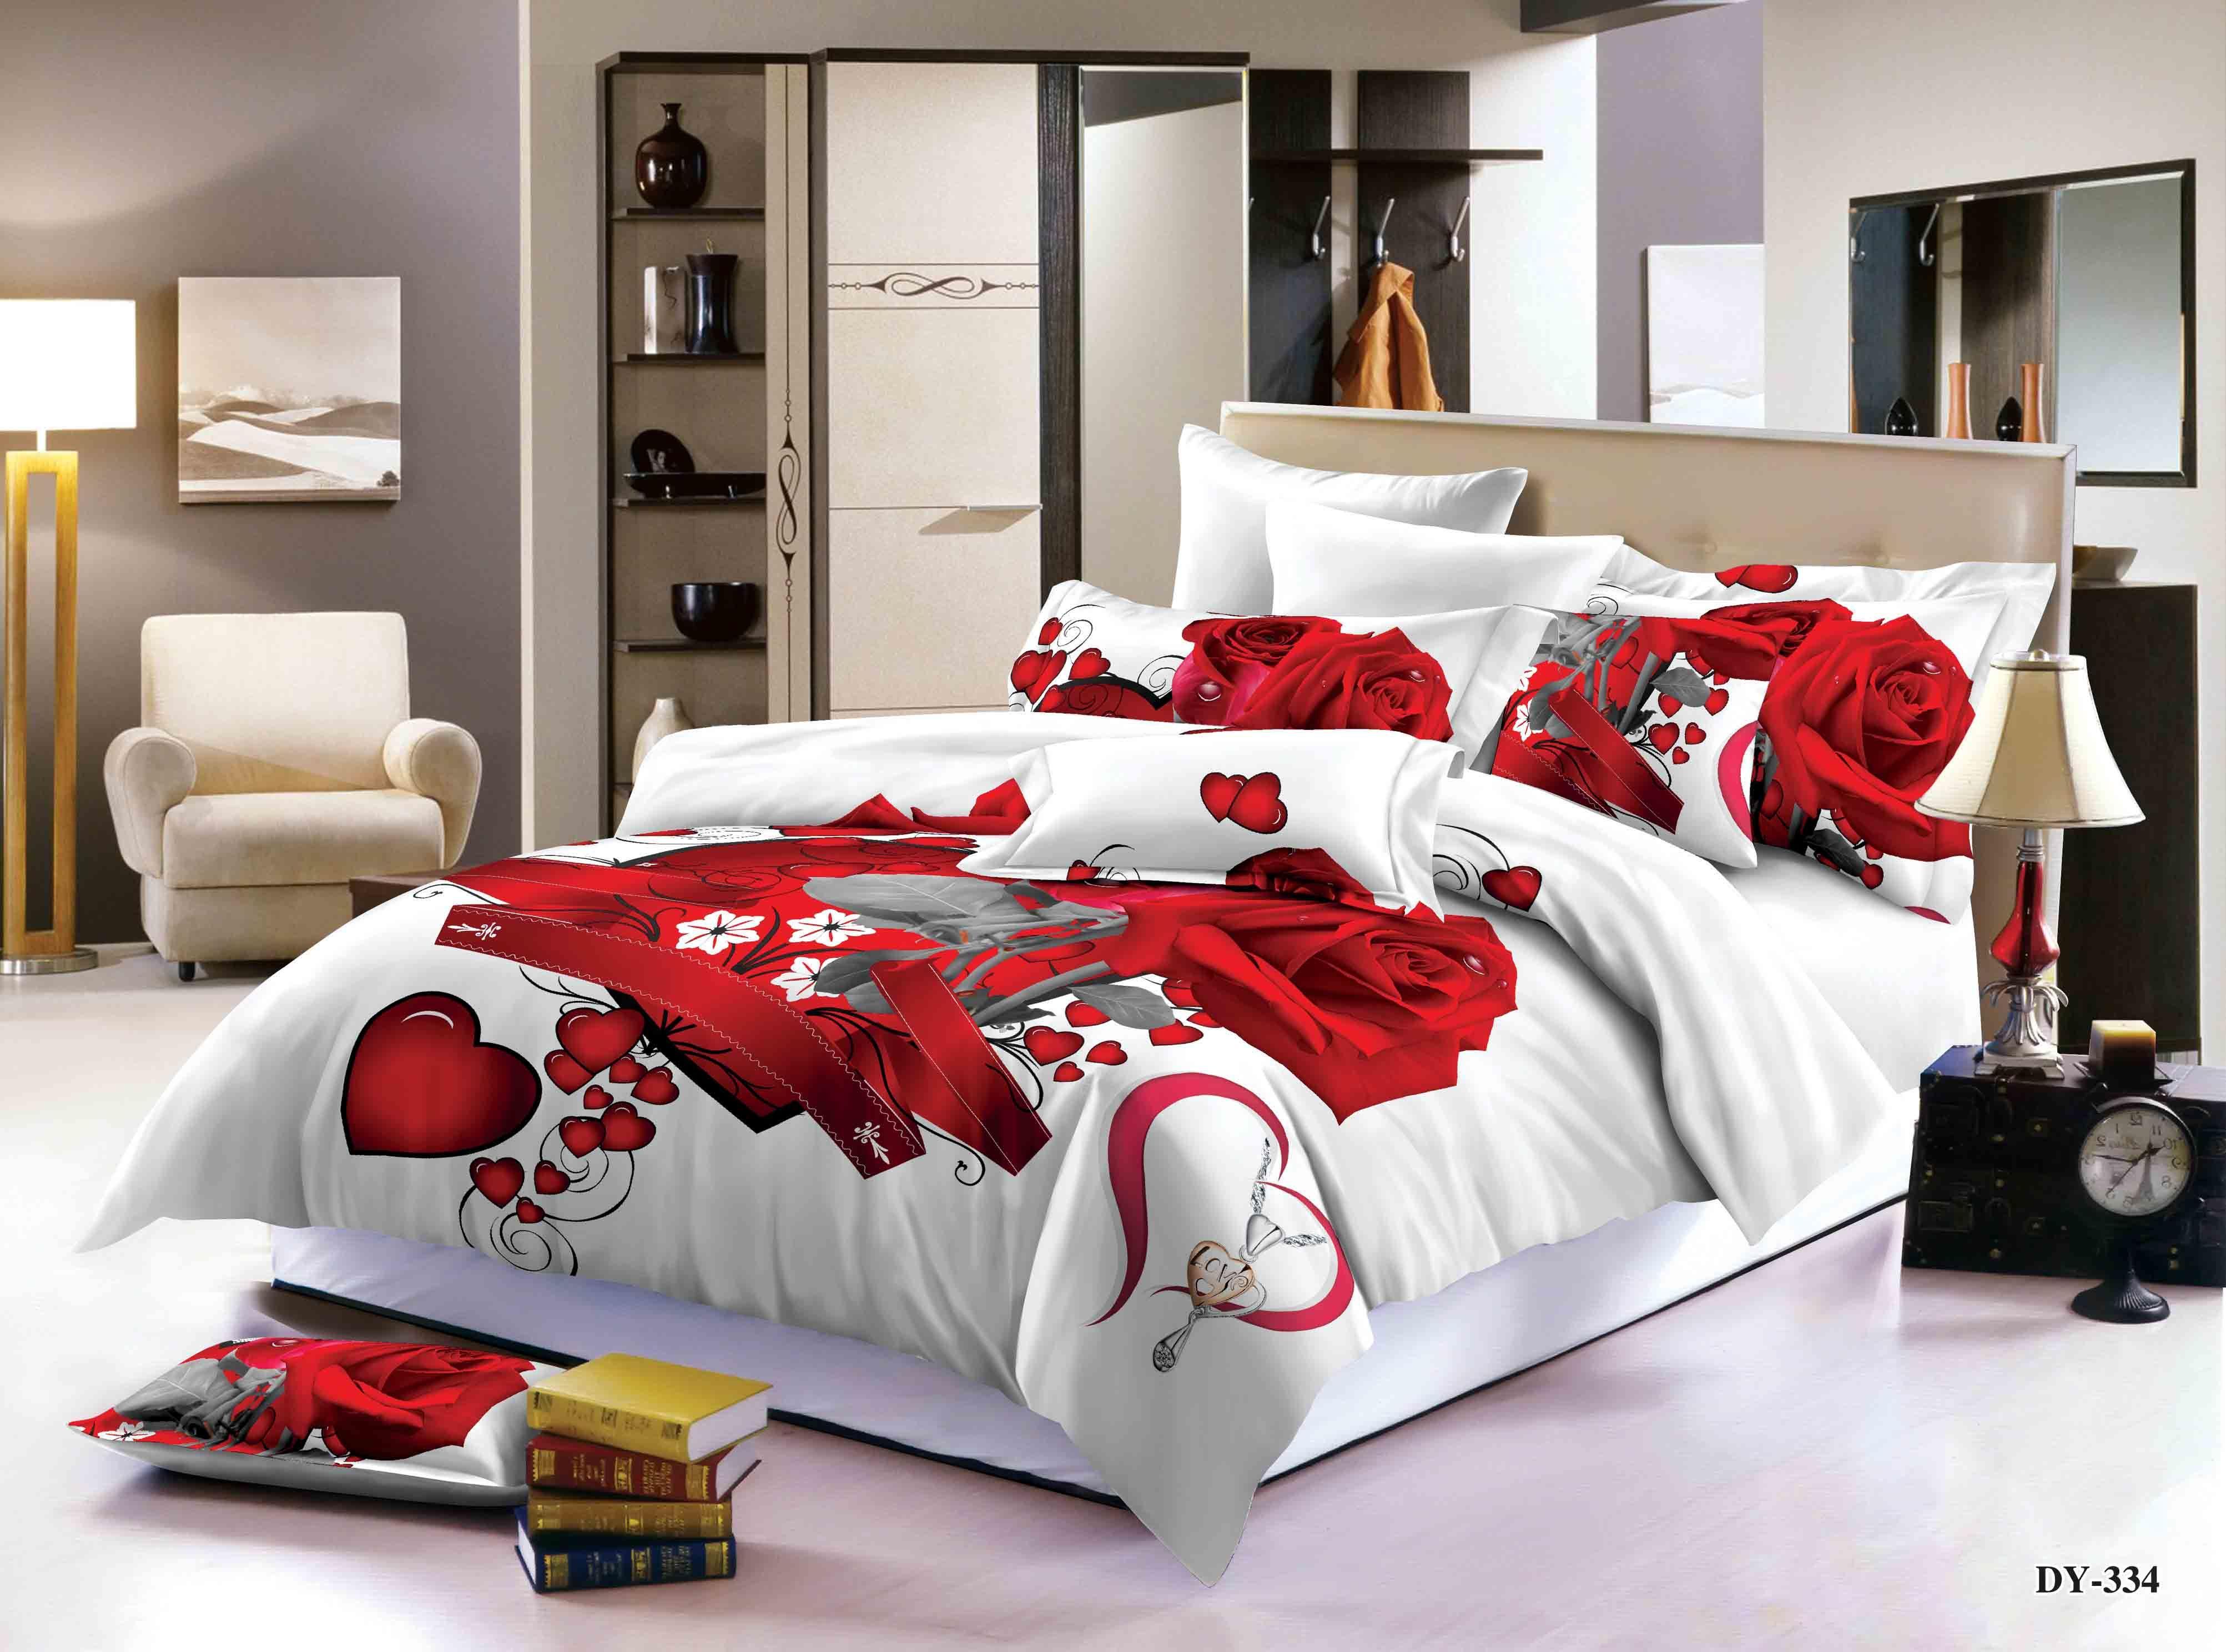 3D Design 4Pcs Duvet Quilt Cover Sets Fitted Sheet Pillowcases Complete Bedding